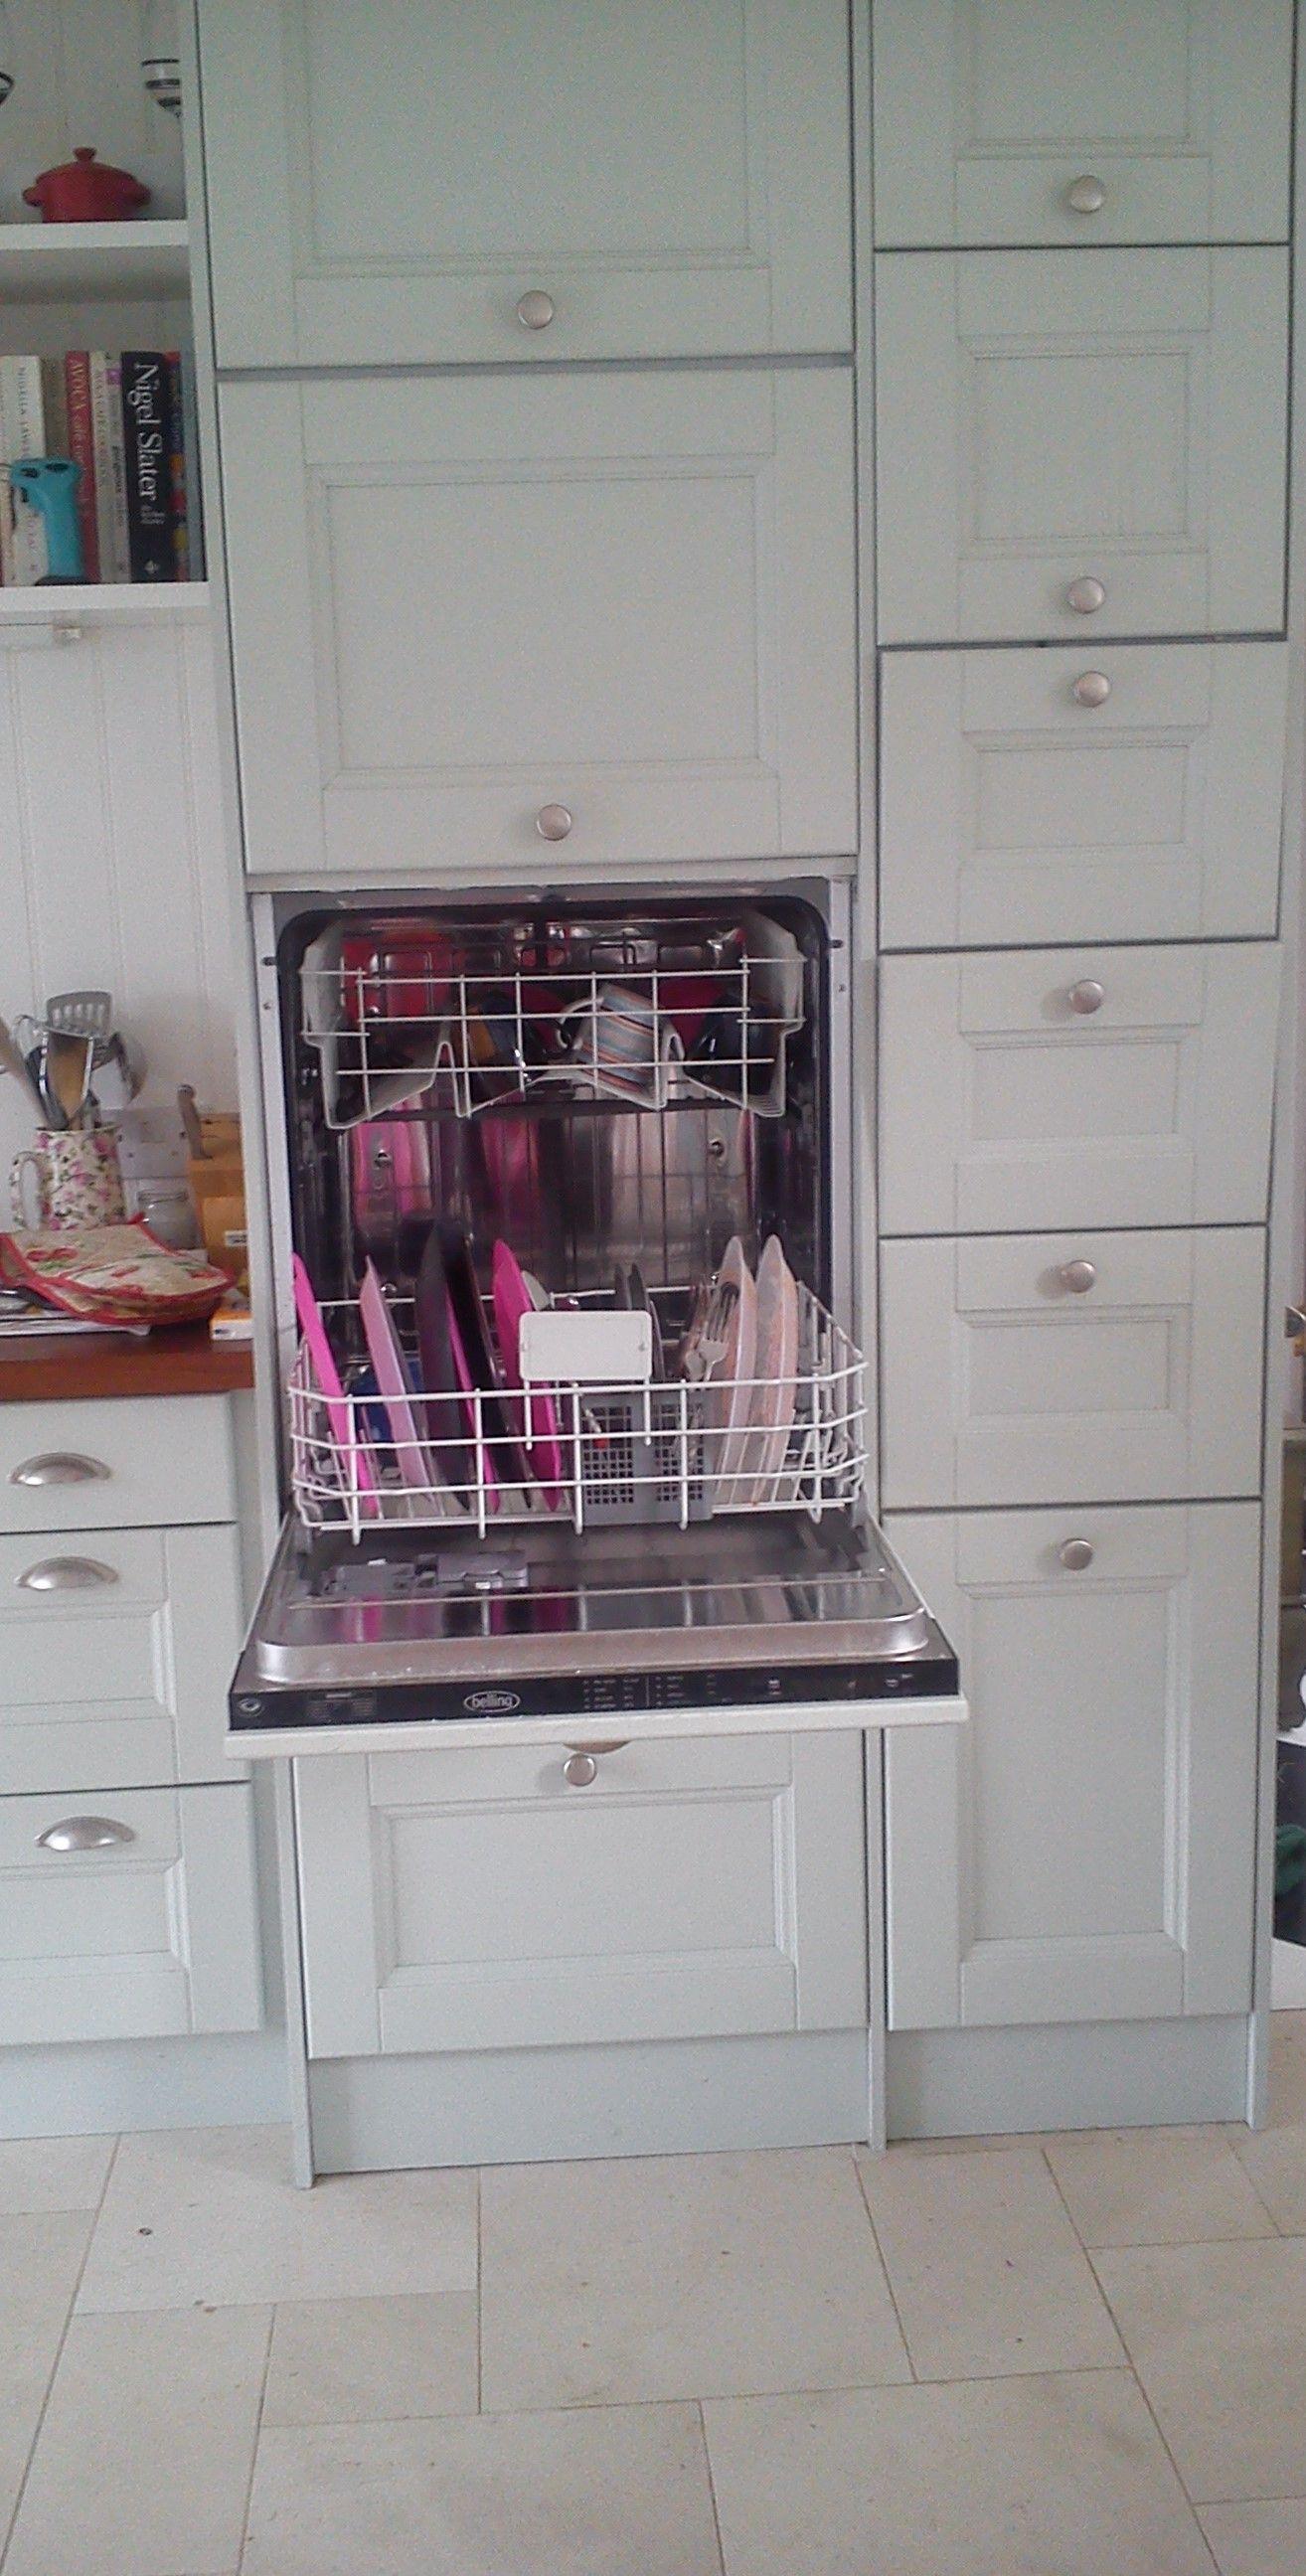 Best Raised Dishwasher No More Bending Kitchen Dishwasher 400 x 300